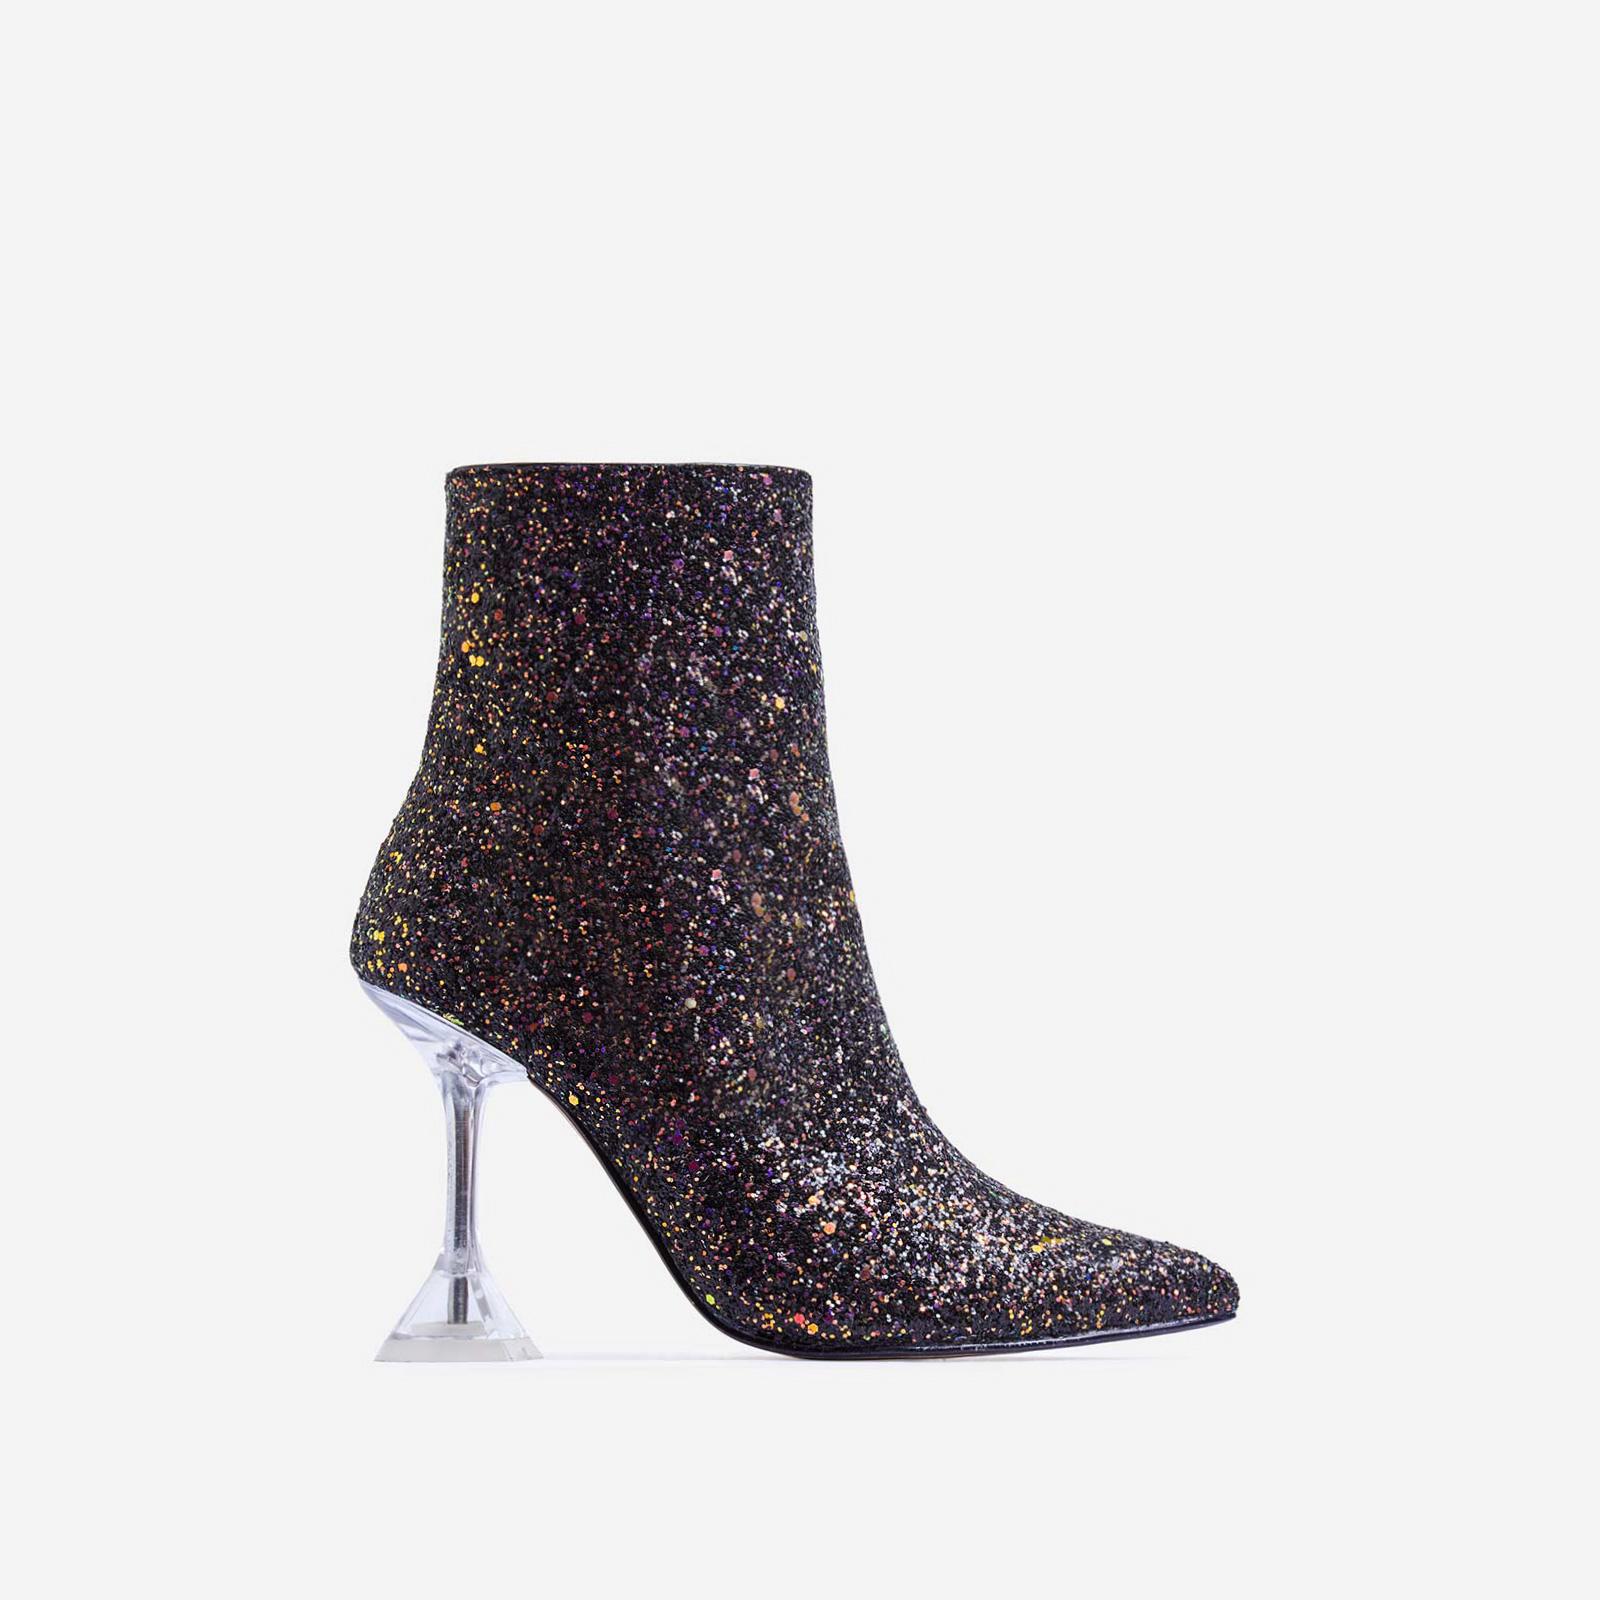 Bacardi Perspex Pyramid Heel Ankle Boot In Black Glitter